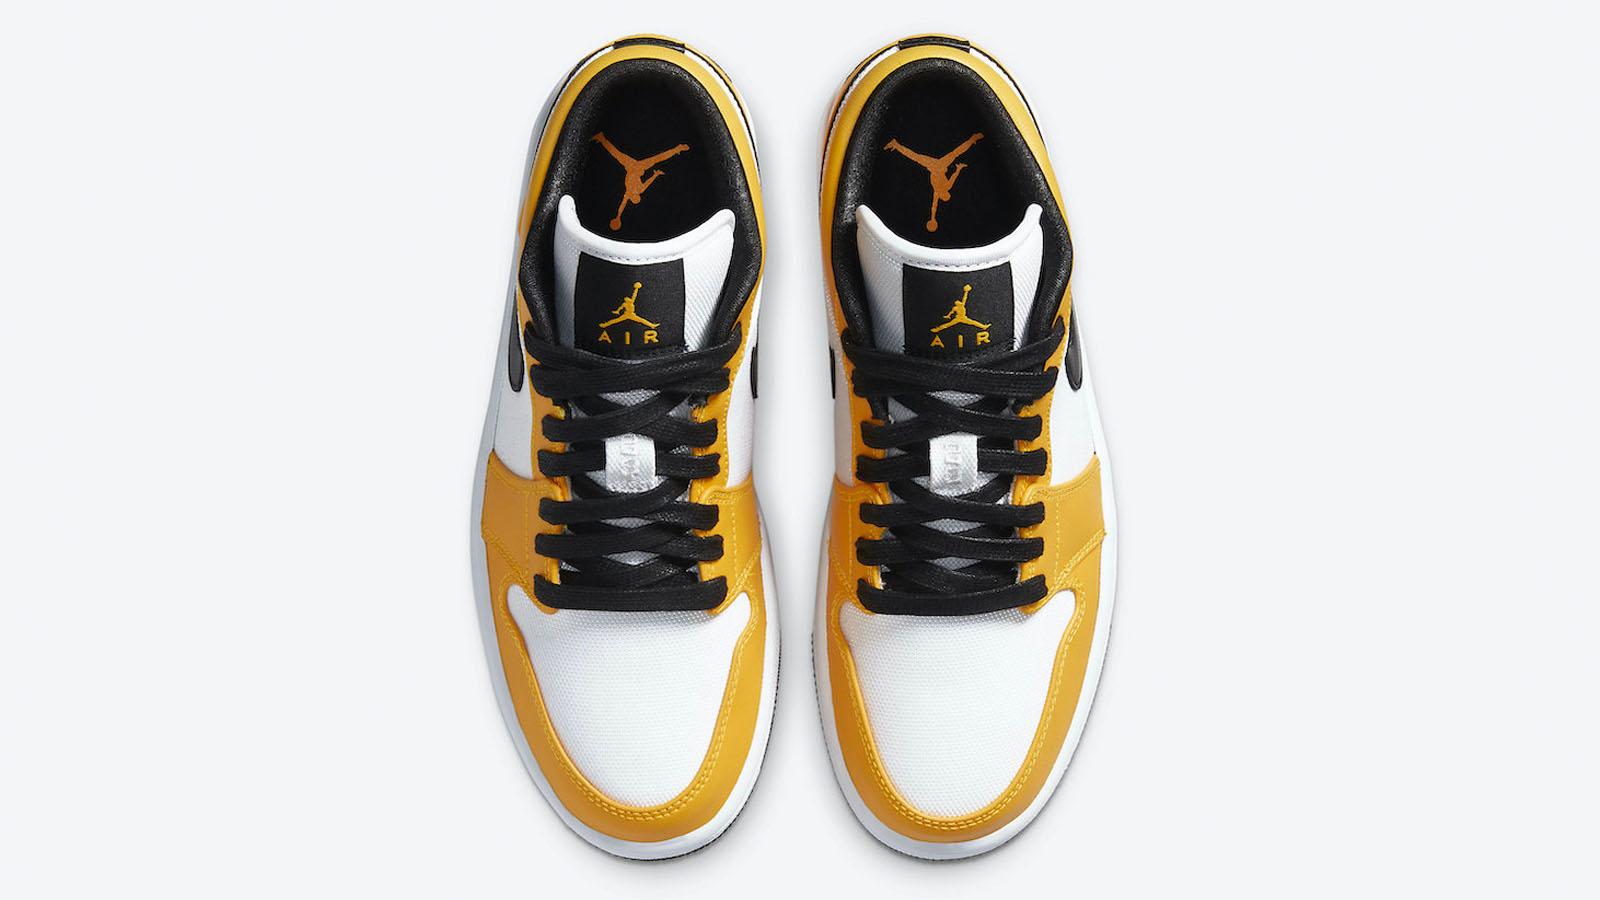 air jordan 1 low yellow black white